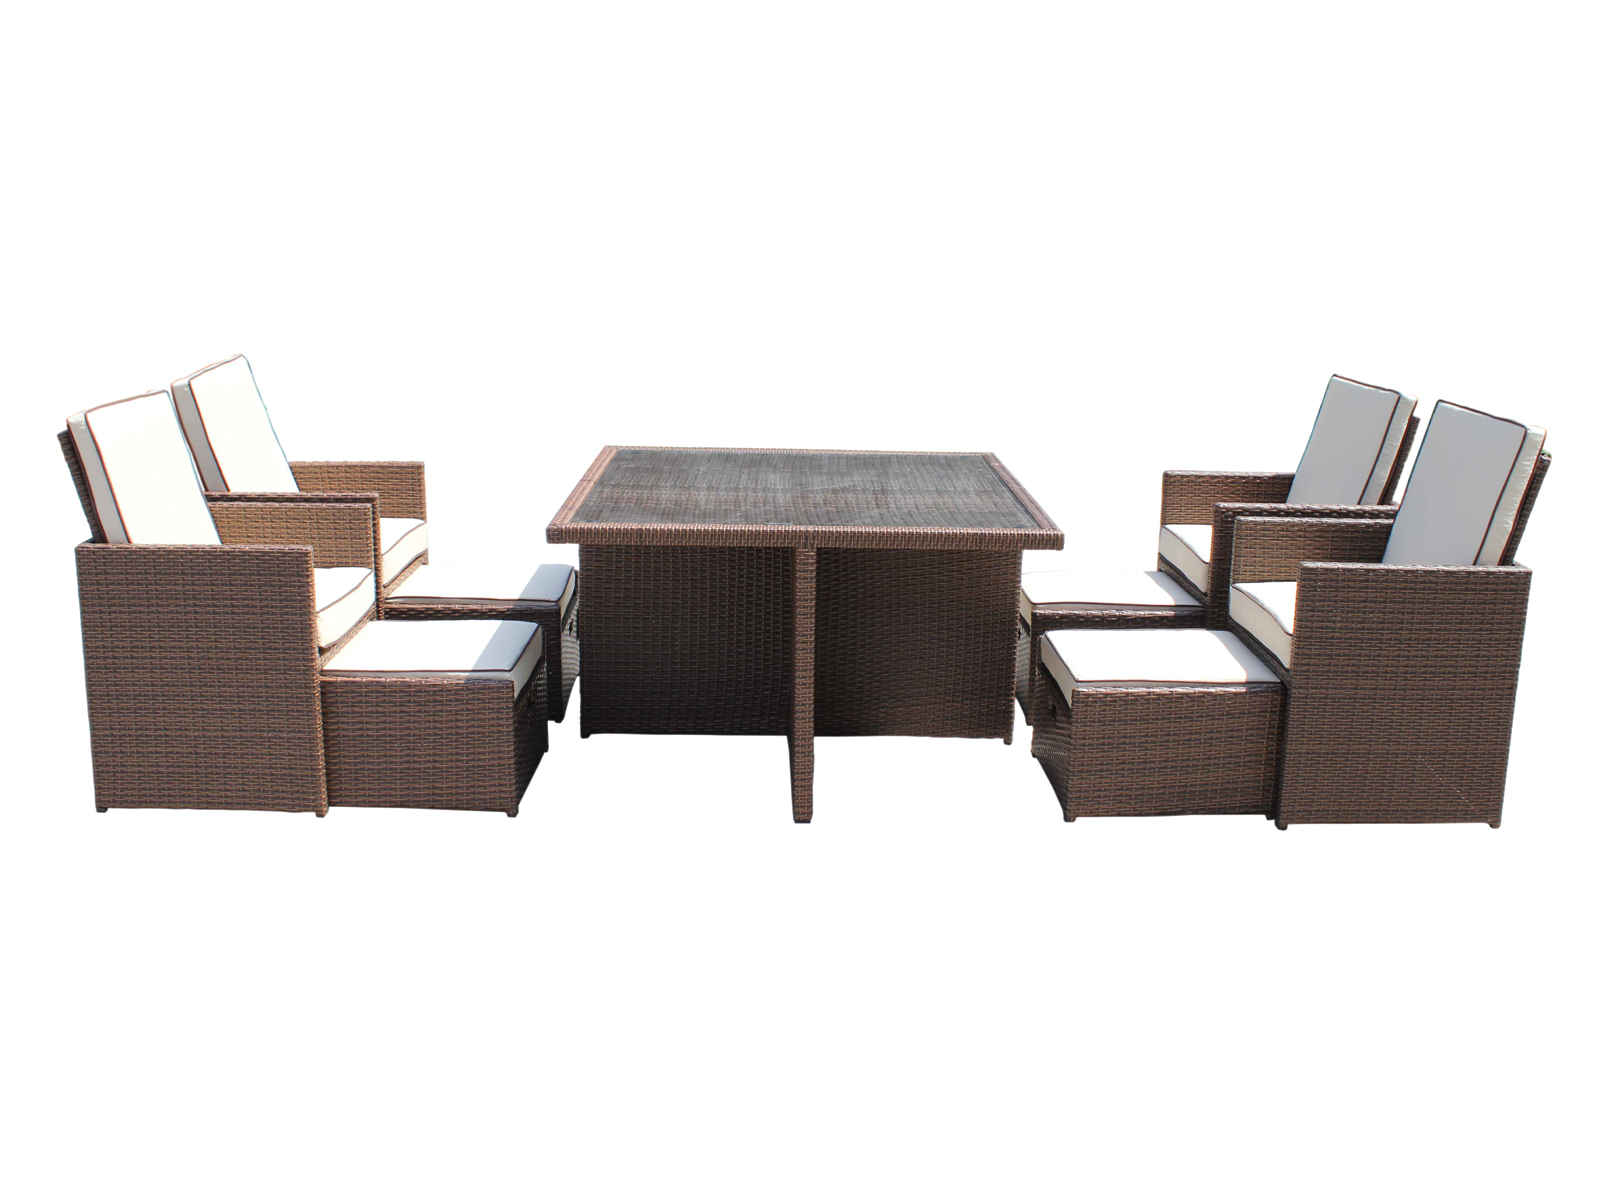 outdoor rattan furniture barcelona 9 piece garden cube set ebay. Black Bedroom Furniture Sets. Home Design Ideas